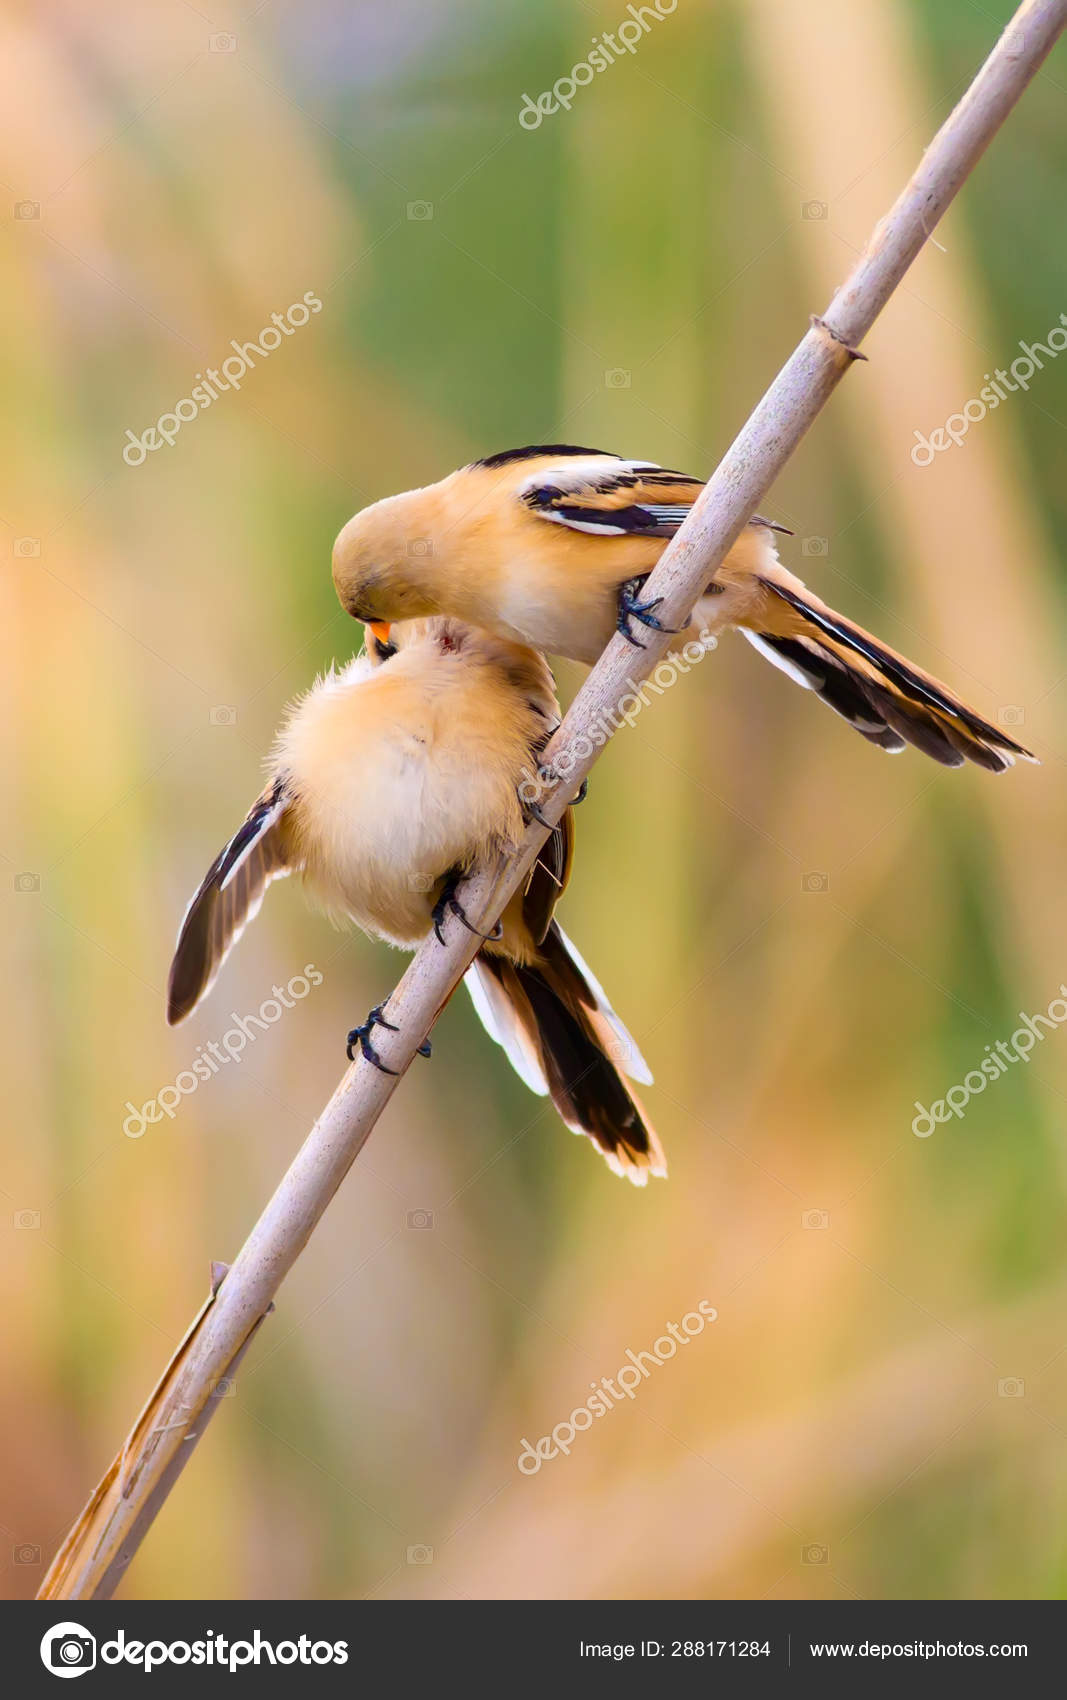 Cute Birds Black Nature Background Bearded Reedling Panurus Biarmicus Stock Photo C Mutan7 288171284